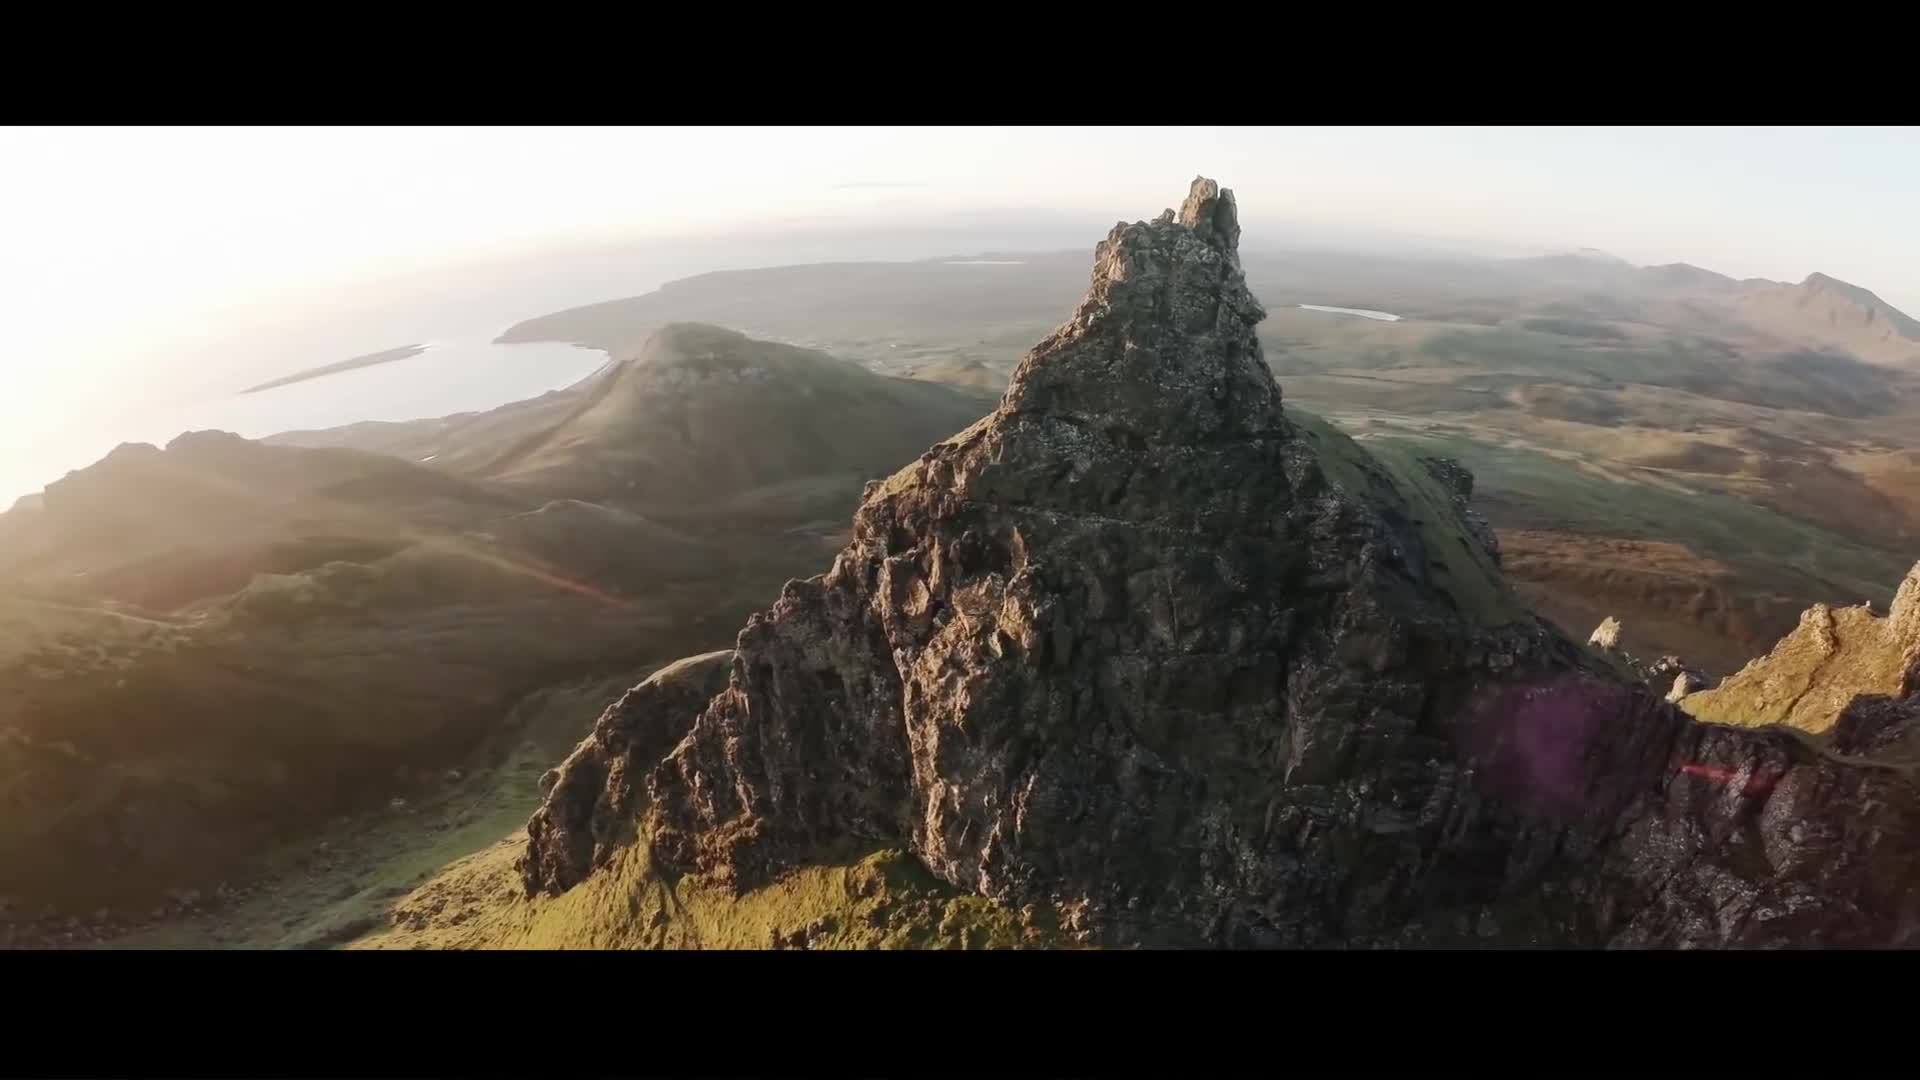 earthgifs, mountains, the kelpies, Beautiful Scotland - Aerial / Drone Showreel GIFs